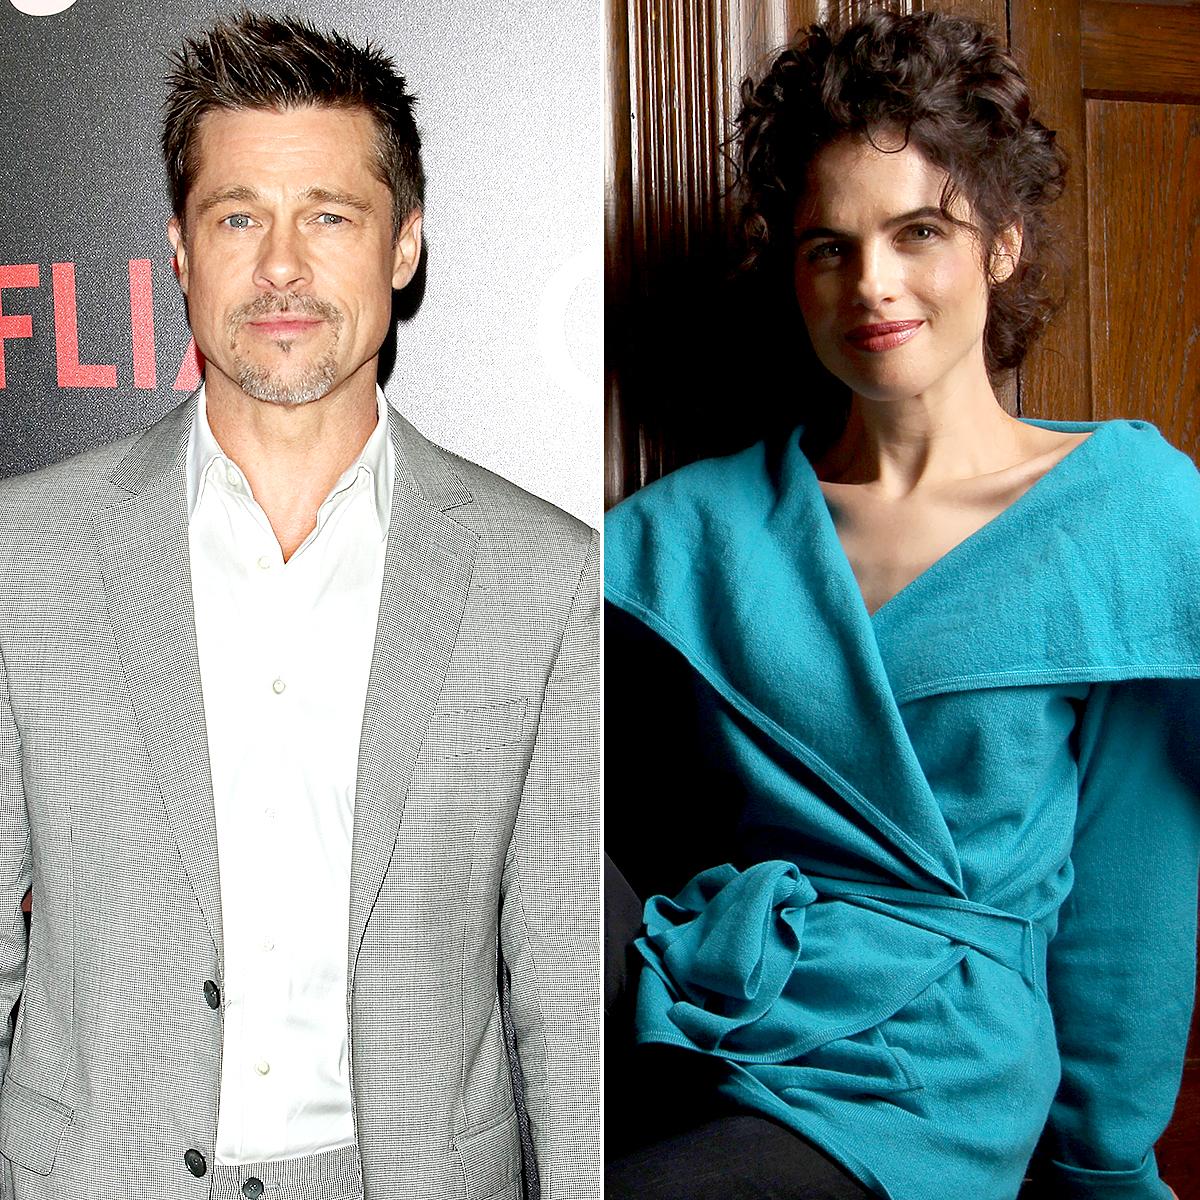 Brad Pitt 'has the keys' to rumoured girlfriend's pad